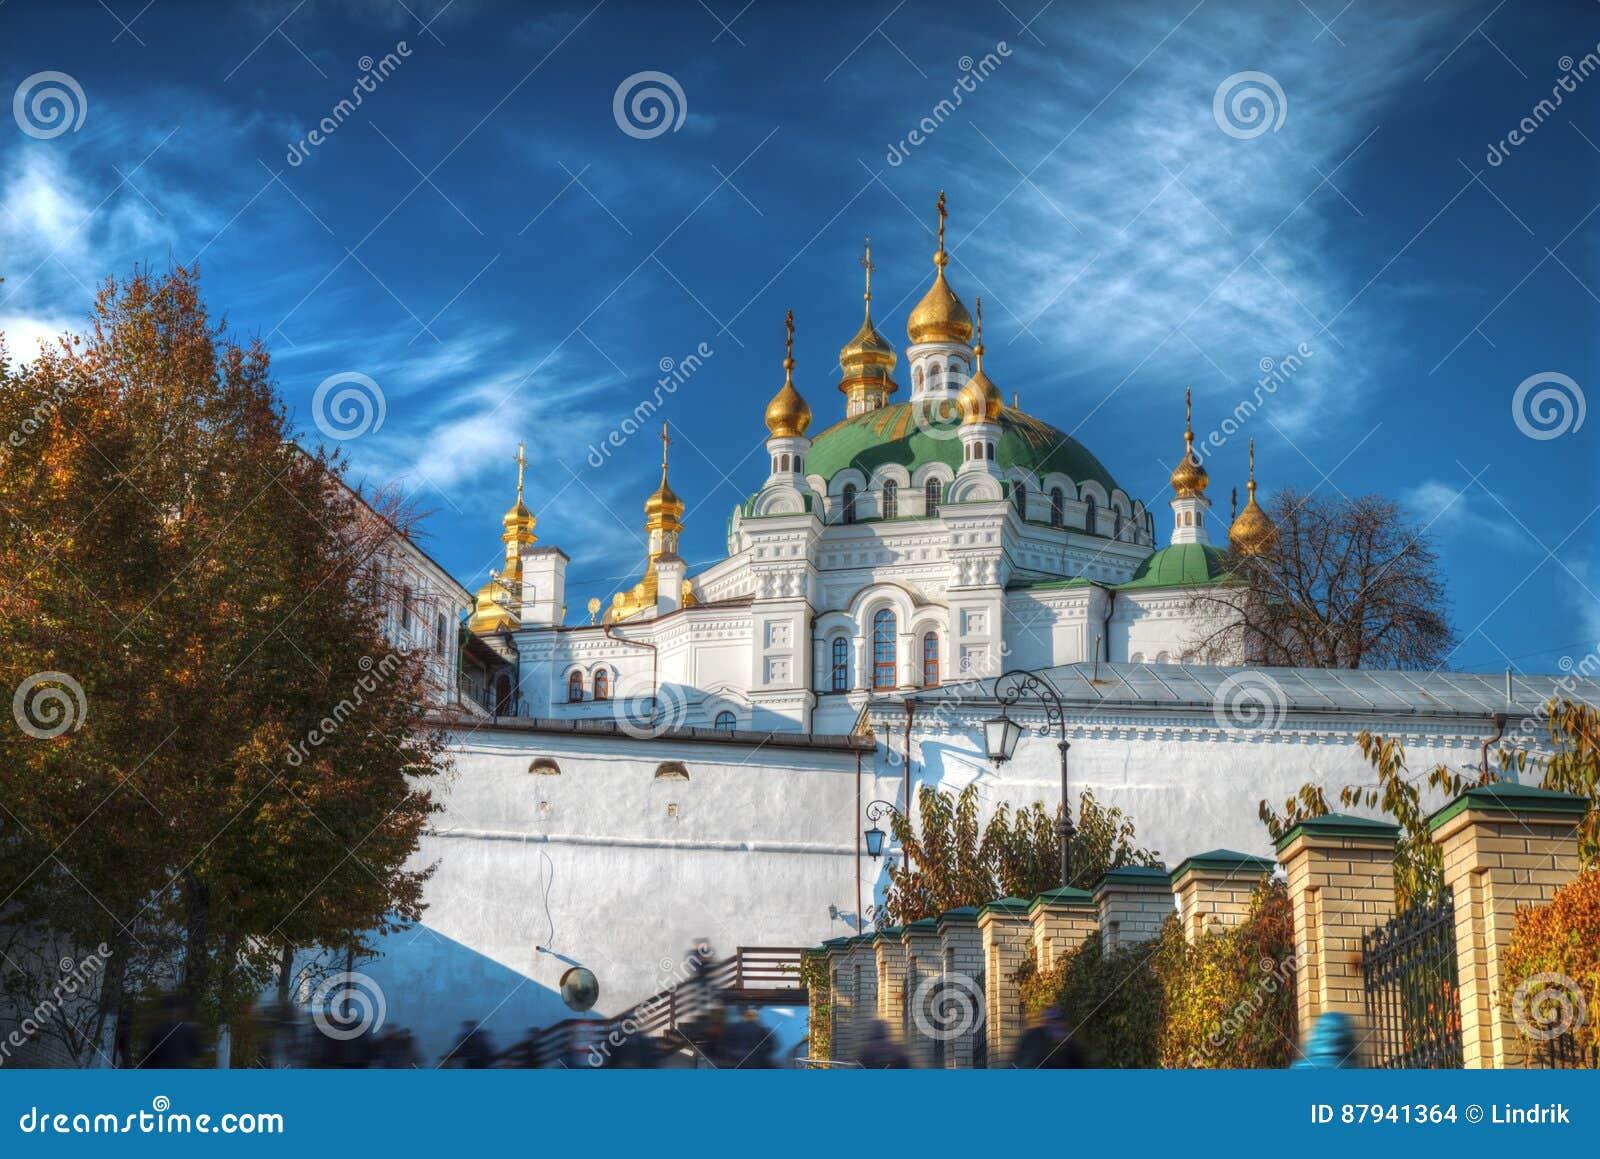 Kiev lavra pechersk widok